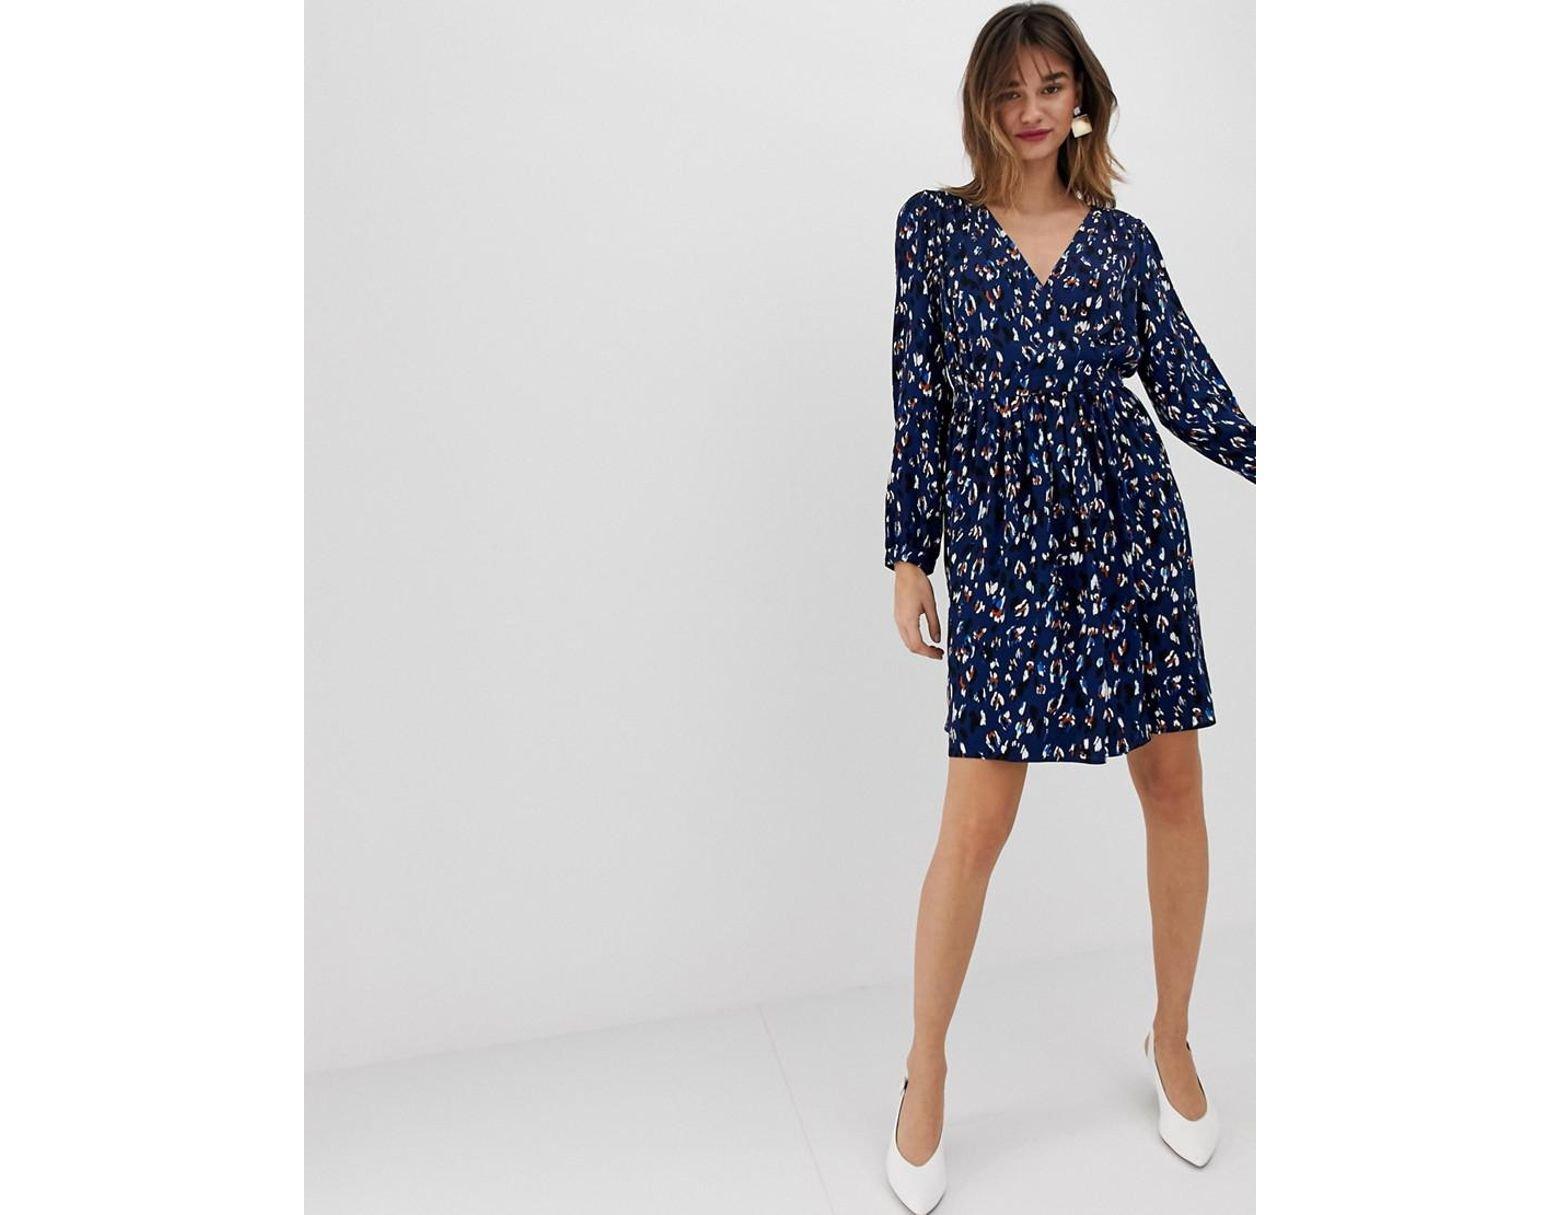 9a28a29e8565 Vero Moda Abstract Leopard Print Wrap Mini Dress in Blue - Lyst